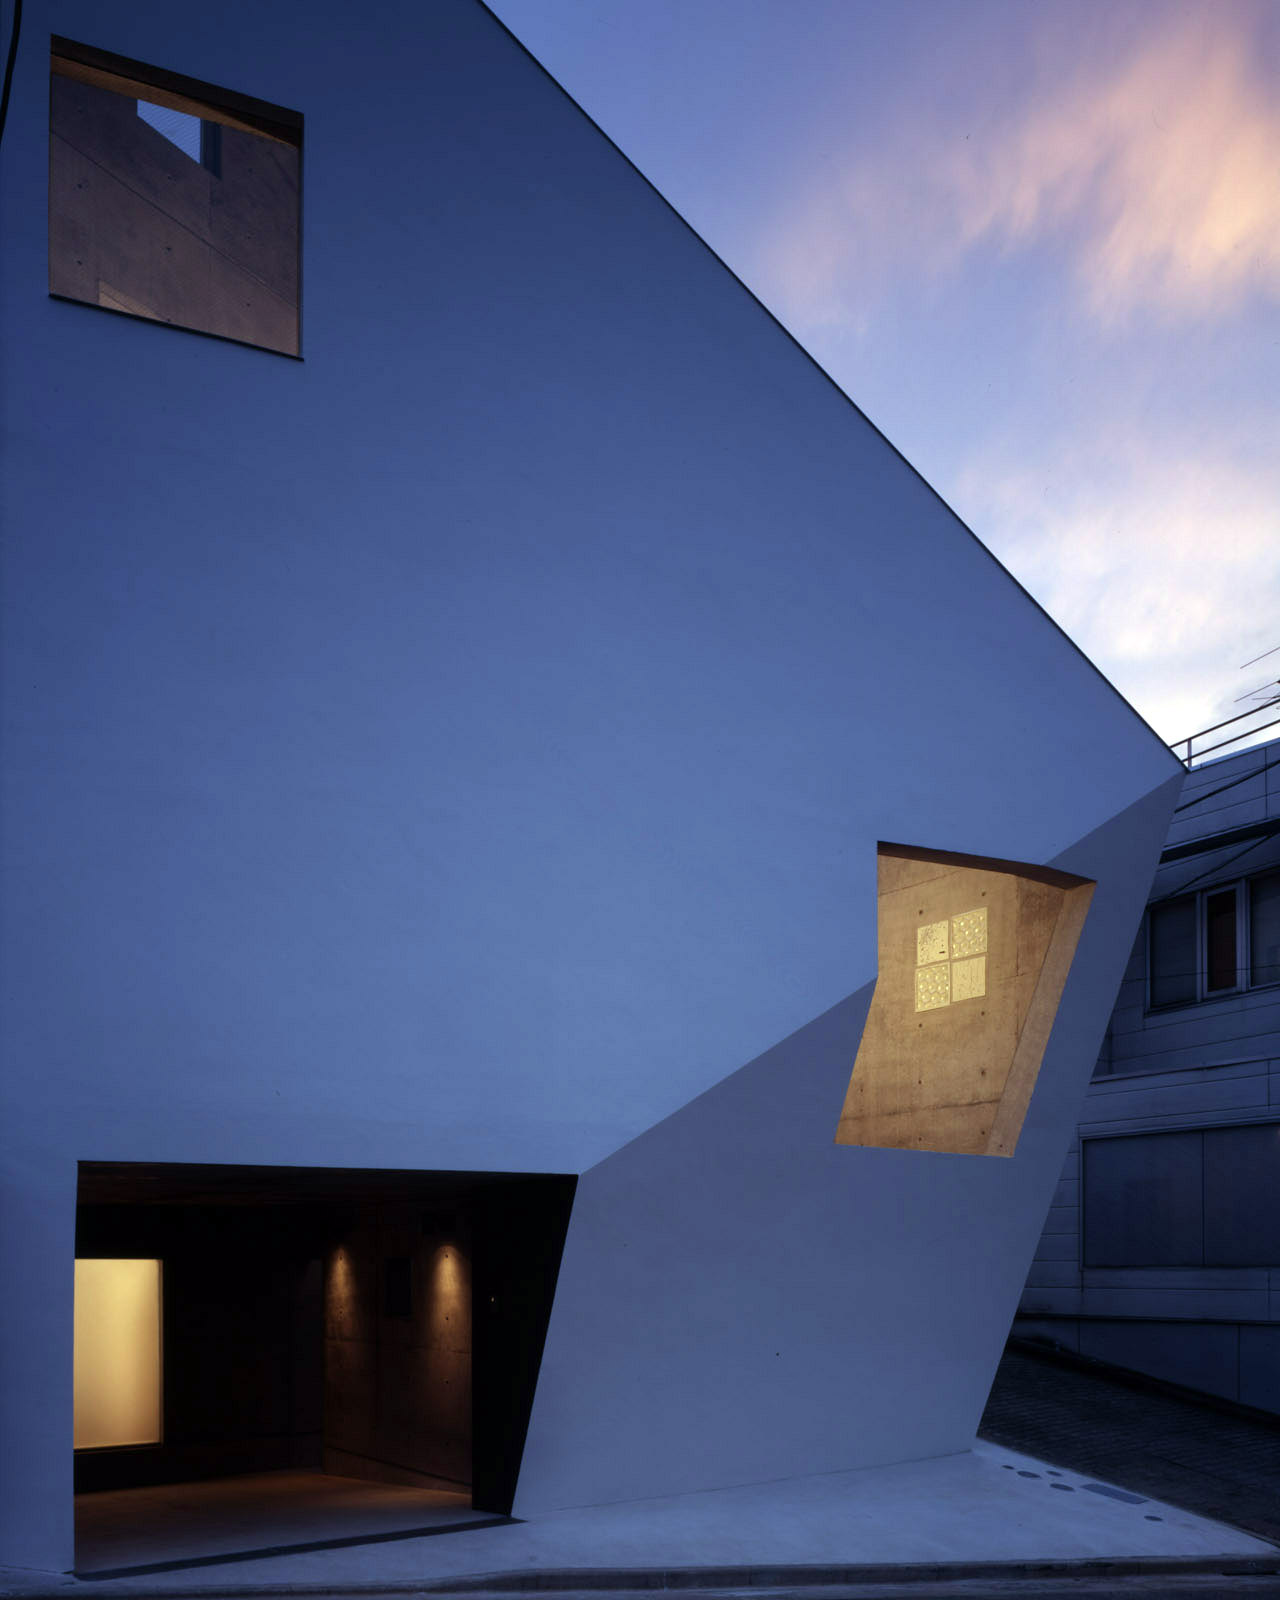 Sky Trace 2006作品集『Kiyoshi Sey Takeyama+AMORPHE』の表紙となった久が原の住宅